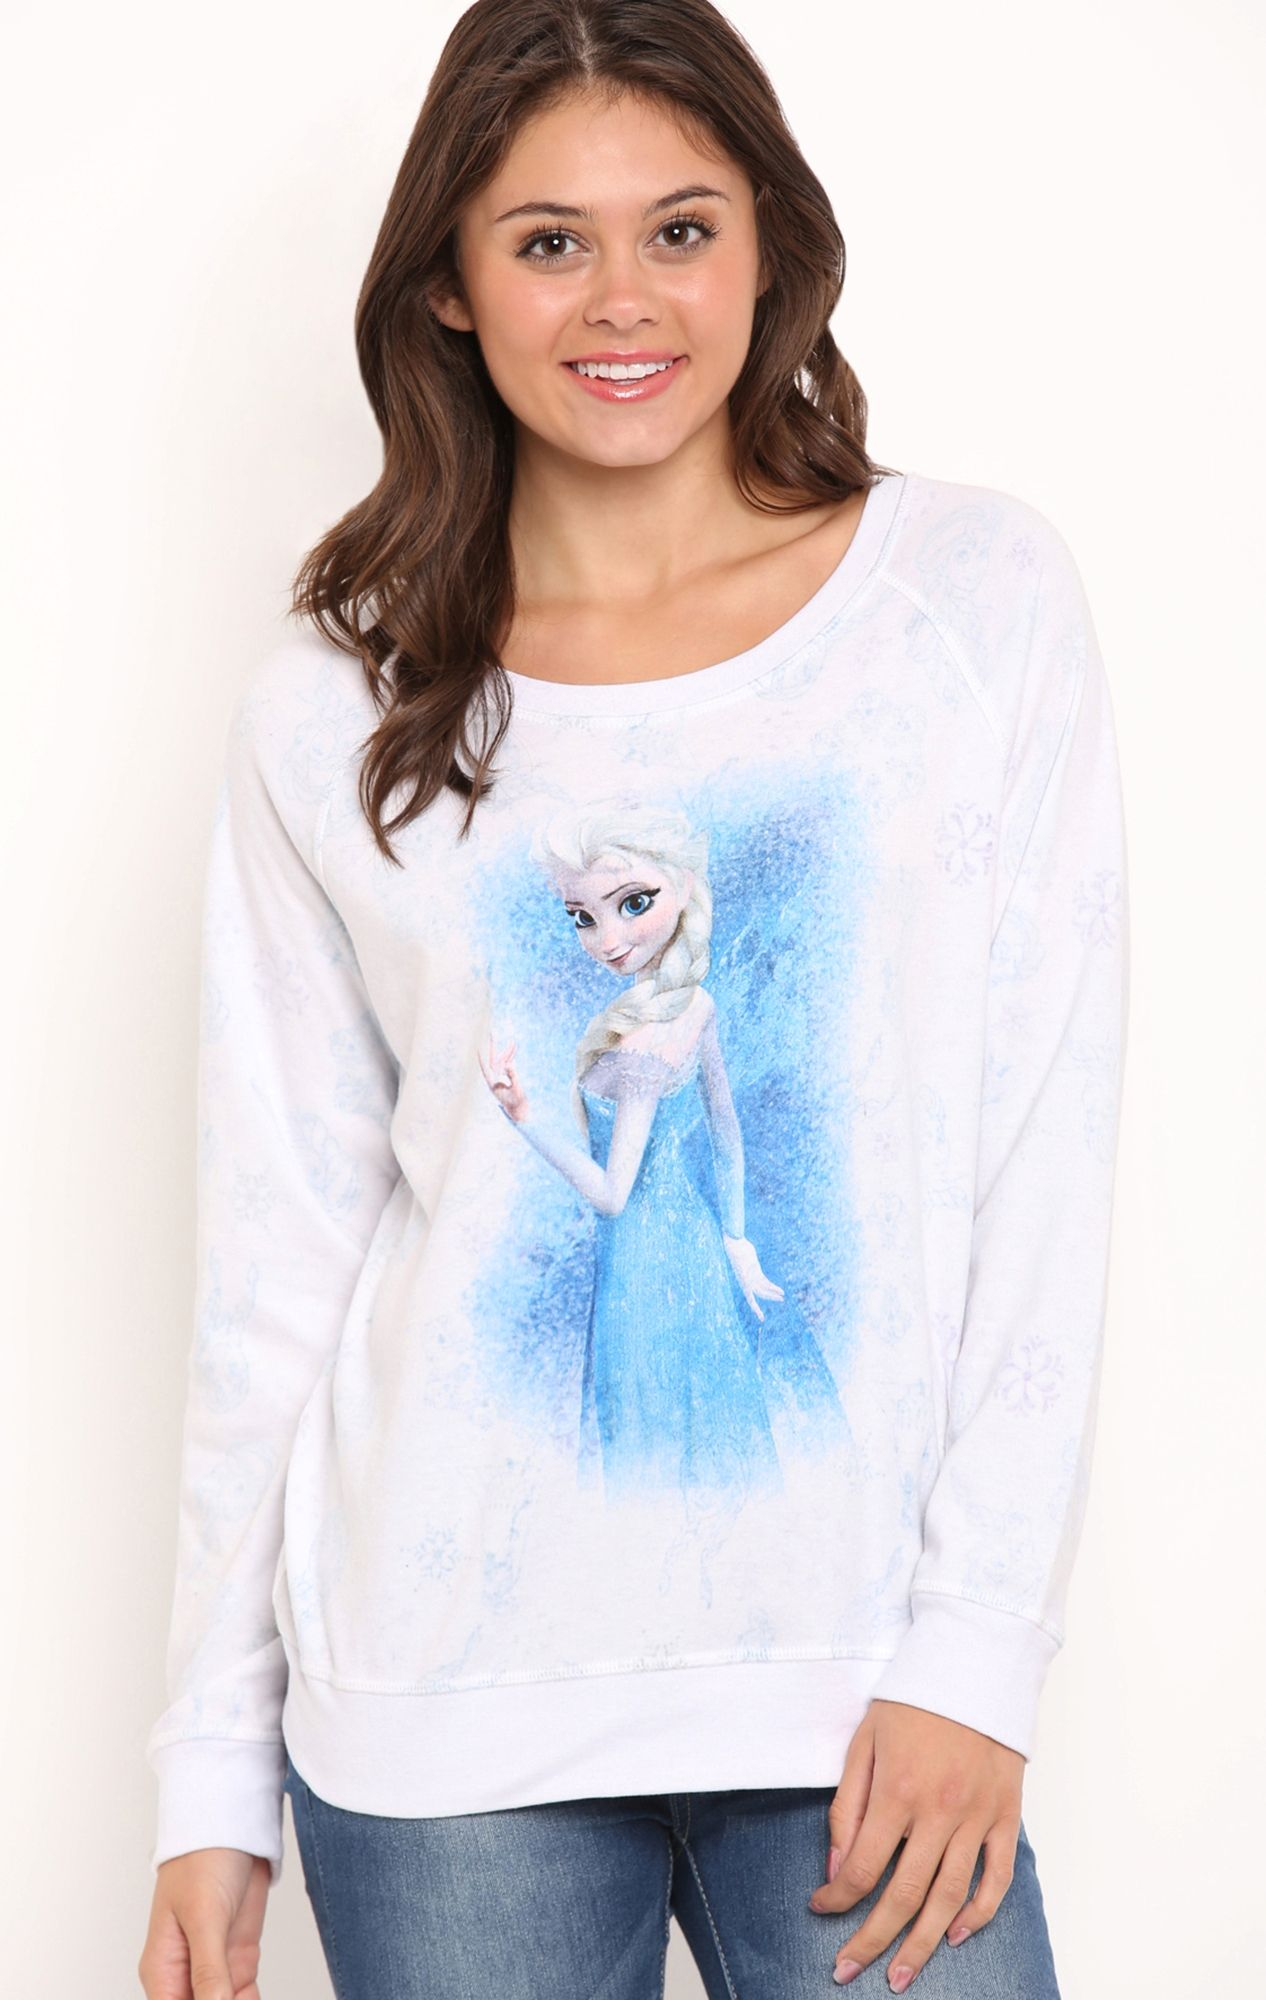 Deb Shops Long Sleeve Reversible Interlock Shirt With Frozen Elsa Allover Screen 19 50 Clothes Fashion Deb Shops [ 2000 x 1266 Pixel ]